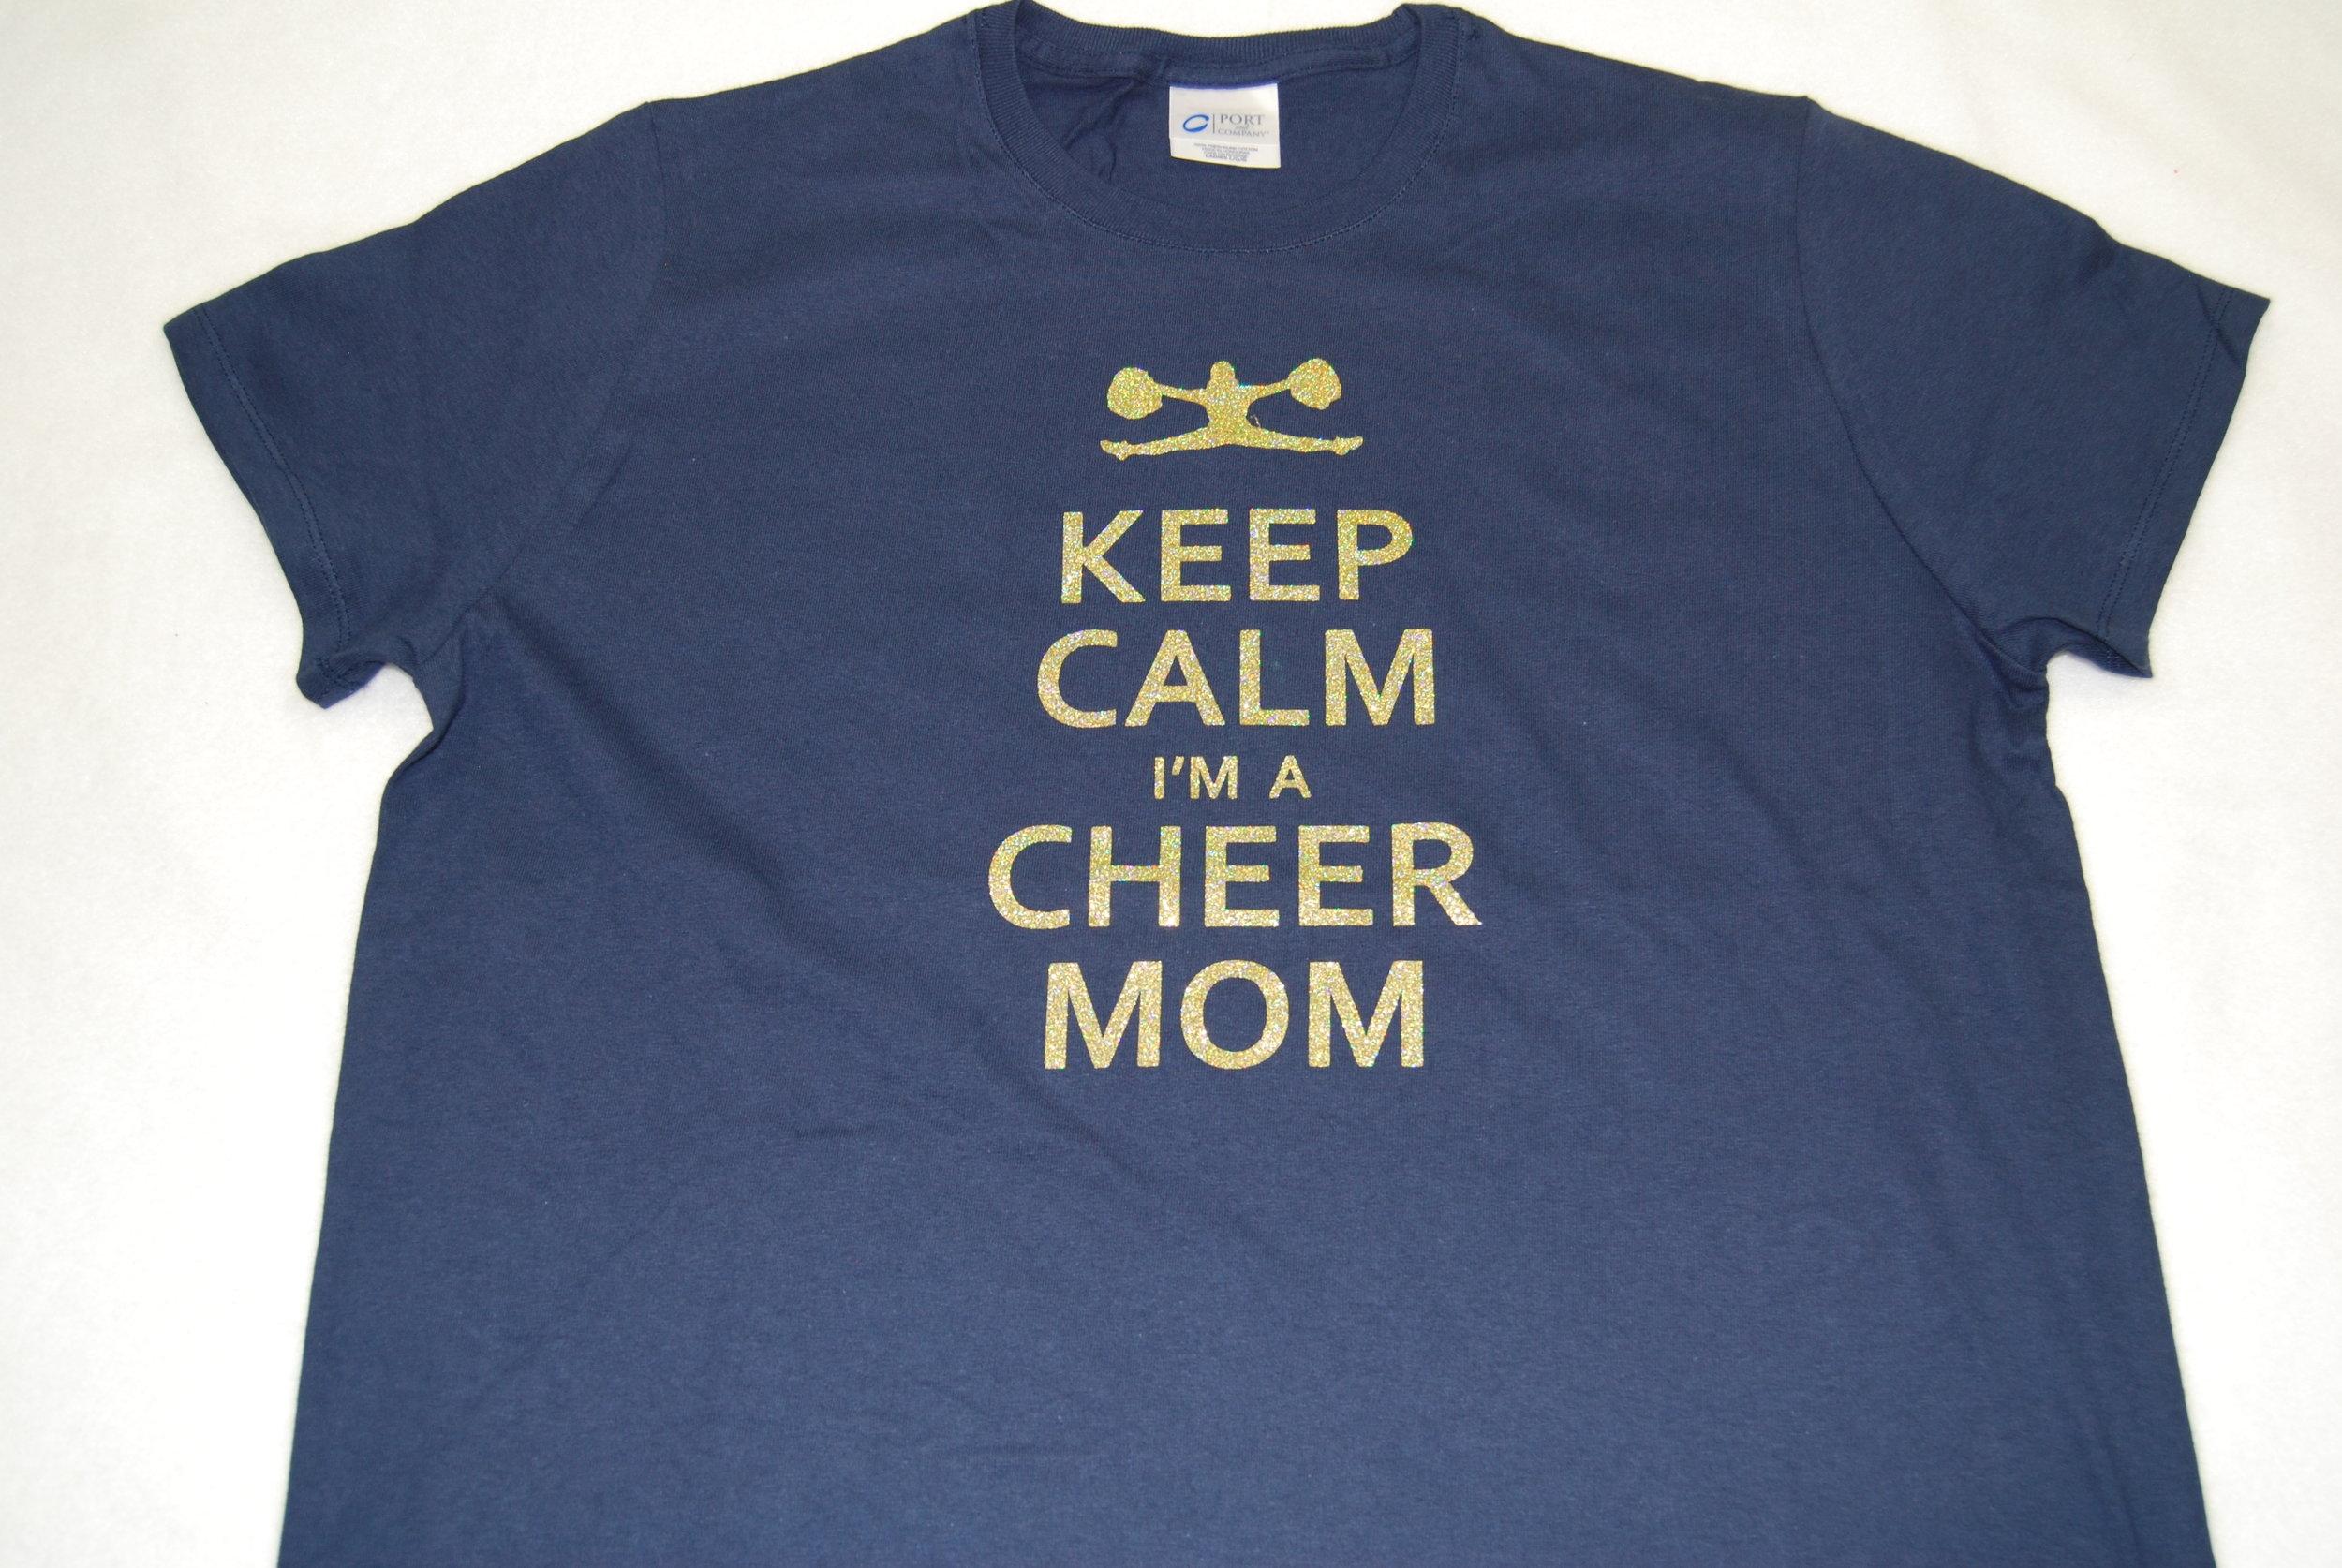 Keep Calm I'm A Cheer Mom in gold glitter